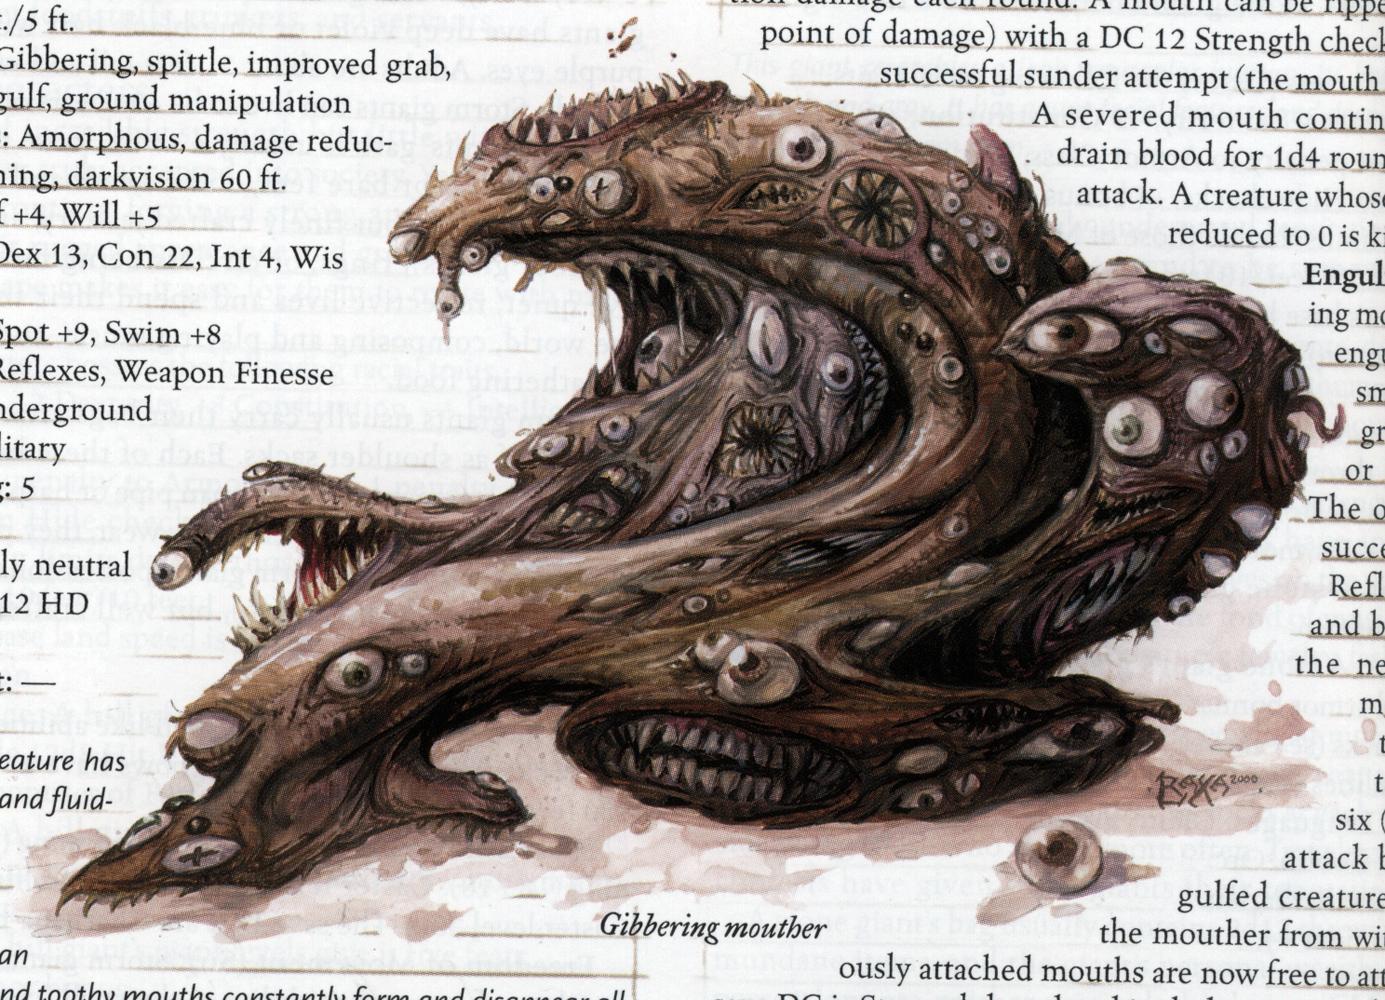 the poison pie publishing house rh poisonpie com monster manual 5e pdf free monster manual 5e anyflip